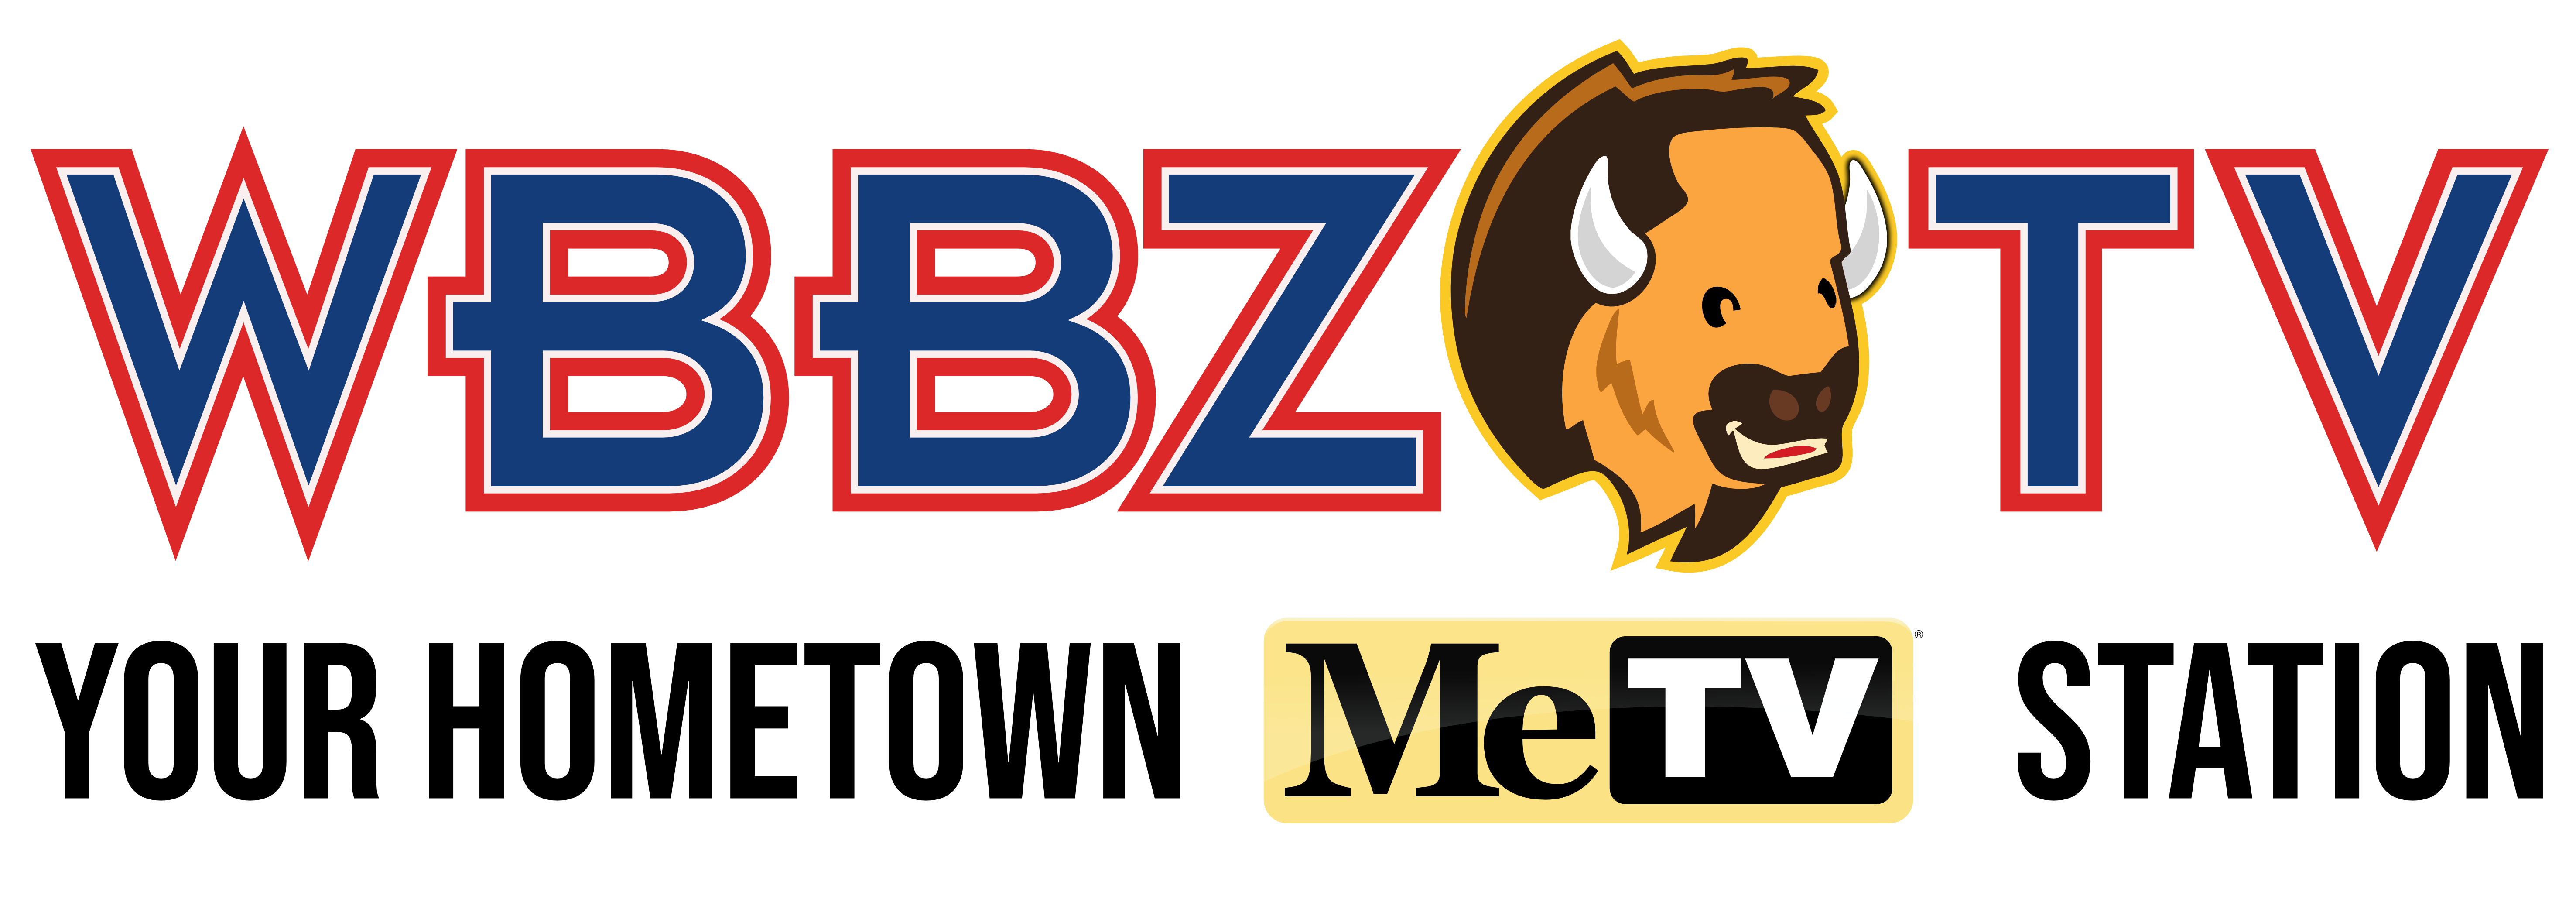 WBBZ-TV Logo Black